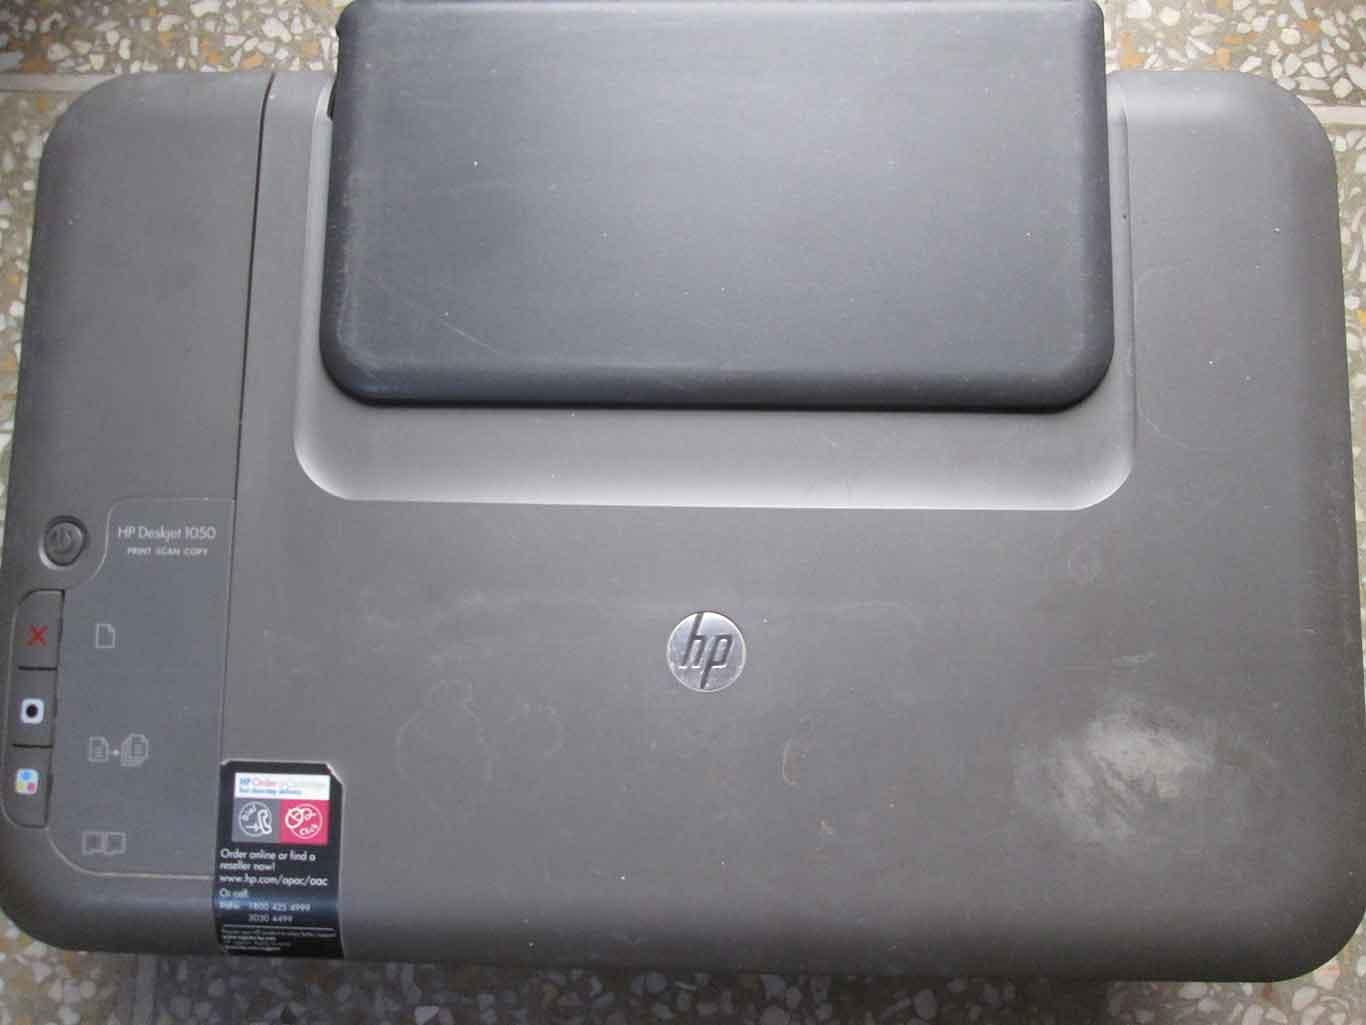 HP DeskJet 1050 All-in-One J410 Series Printer, Scanner, Photocopier